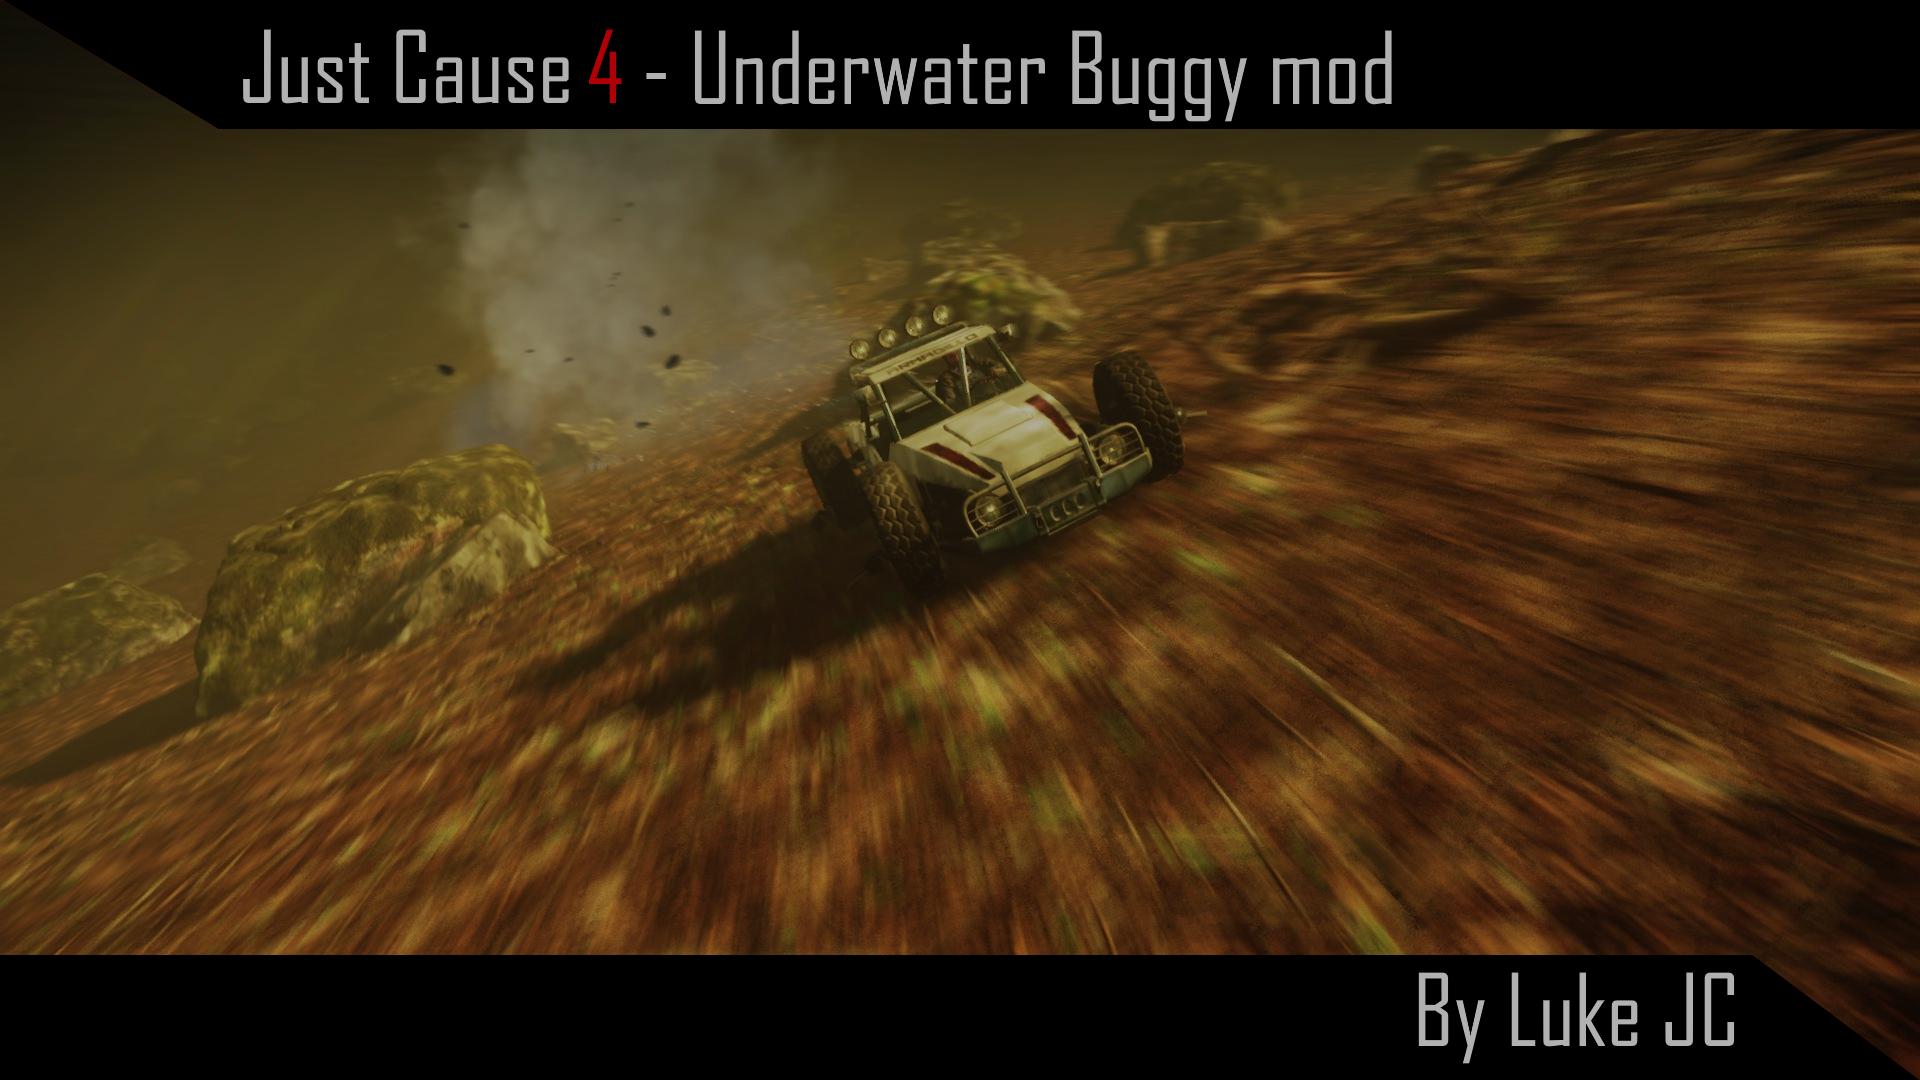 Underwater Buggy